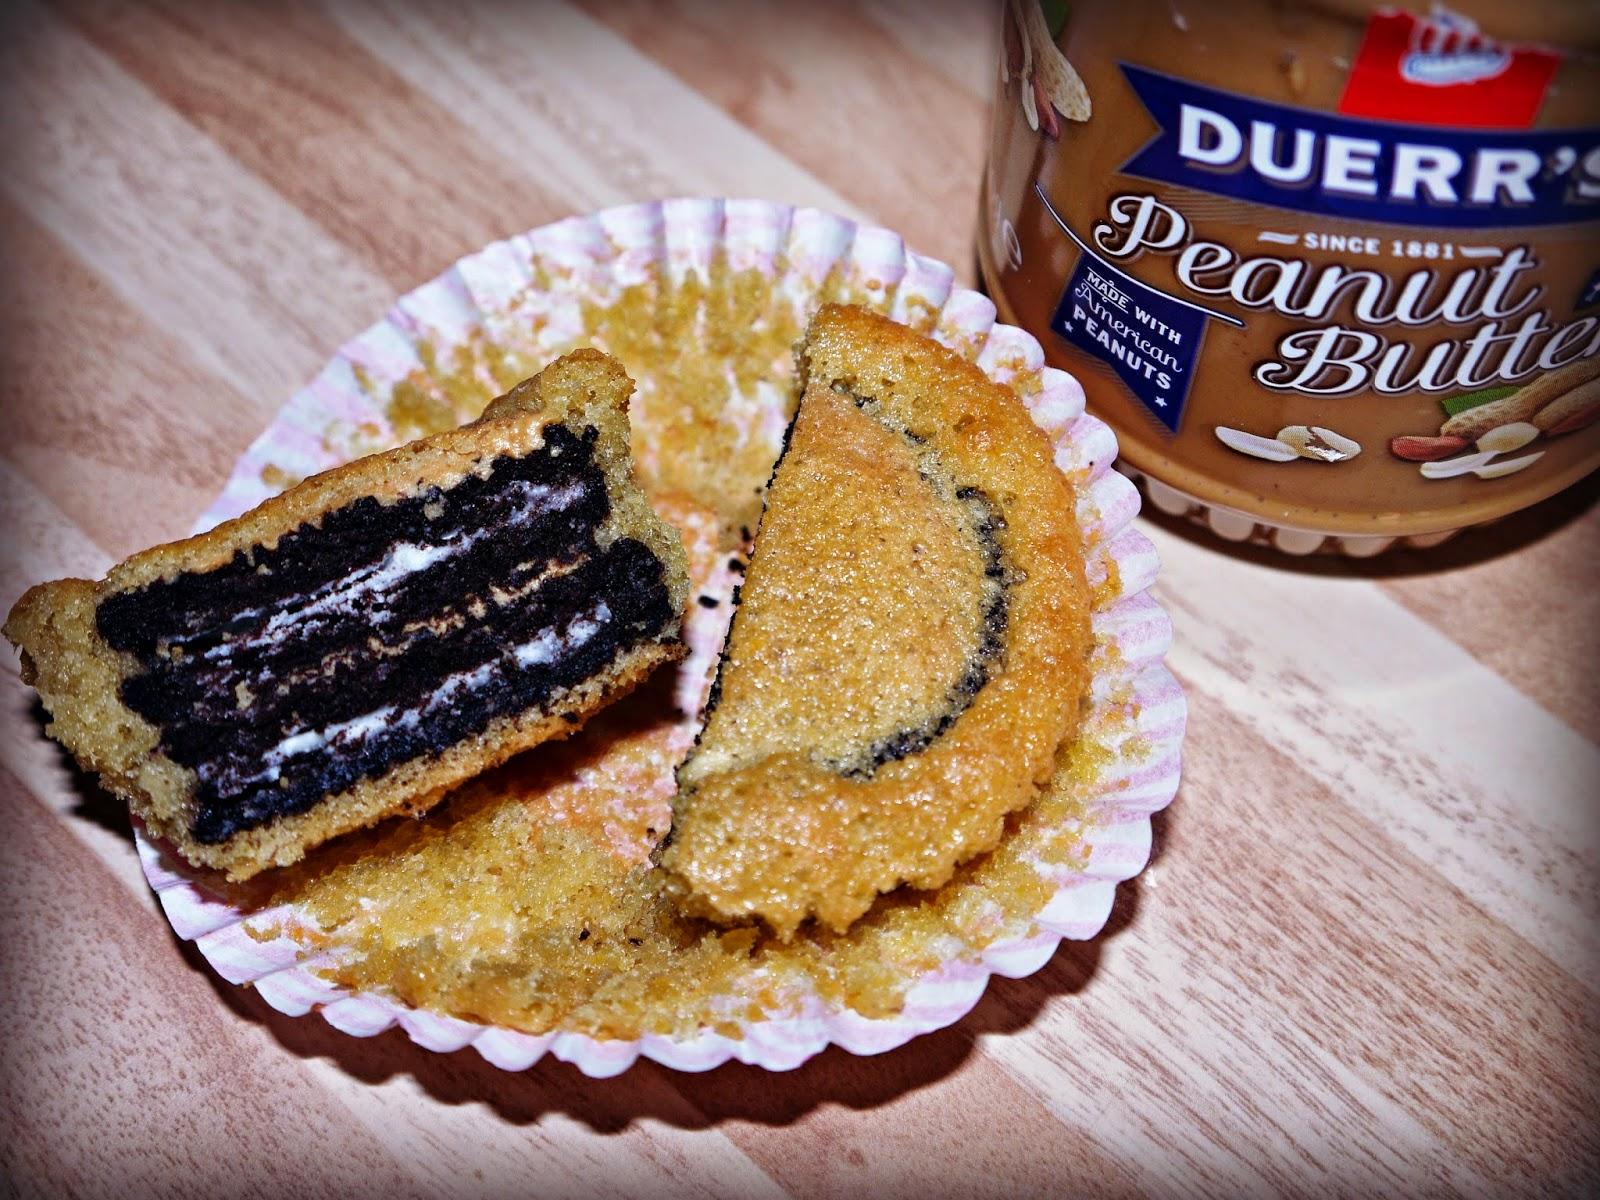 cupcake, Oreo, peanut butter